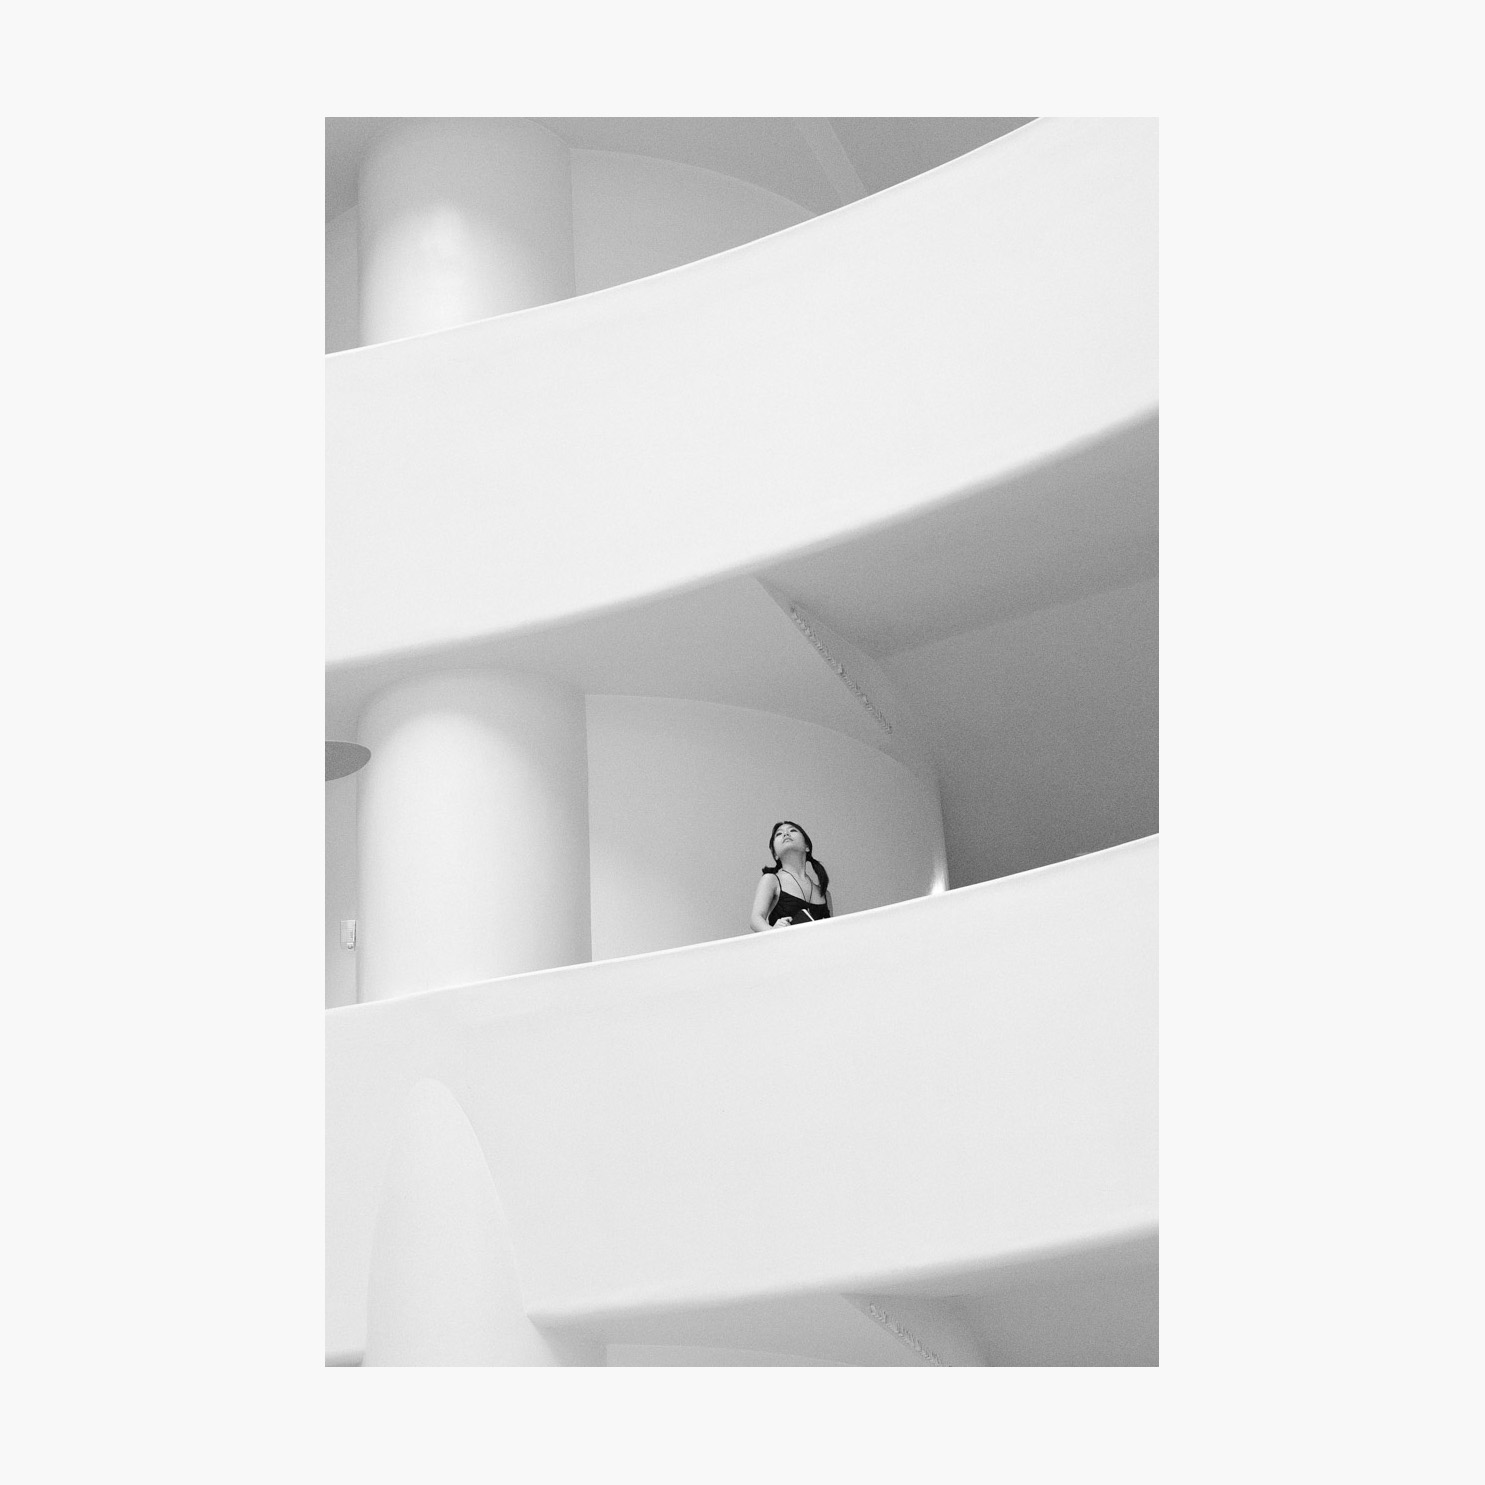 ©-2018-Harry-W-Edmonds-London-Photographer-Missing-the-Shot-PN03.jpg